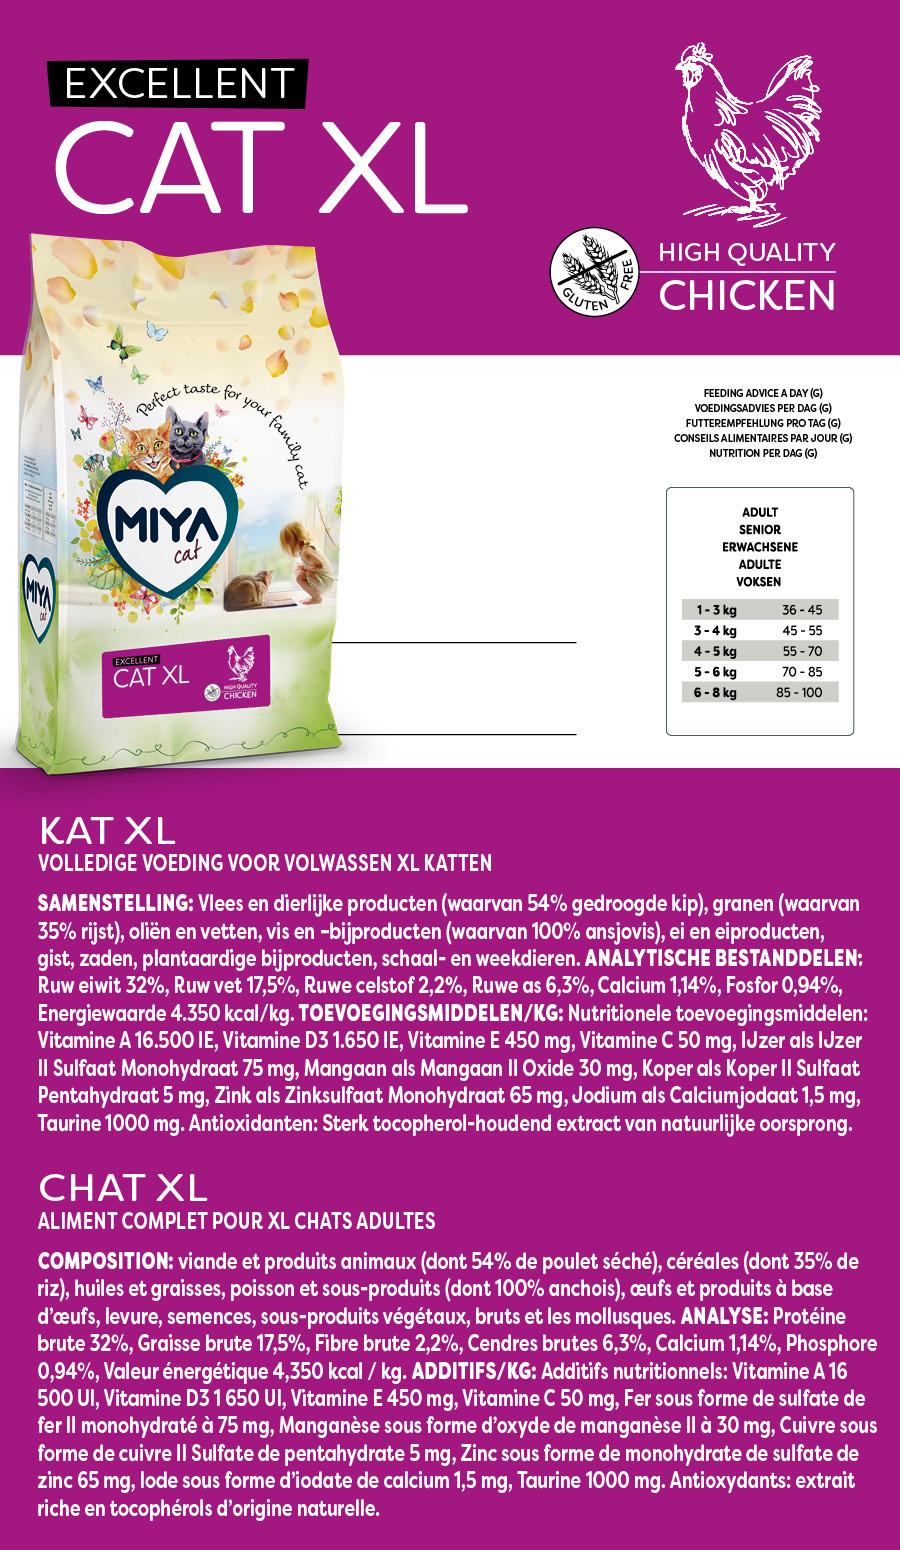 Miya Cat XL